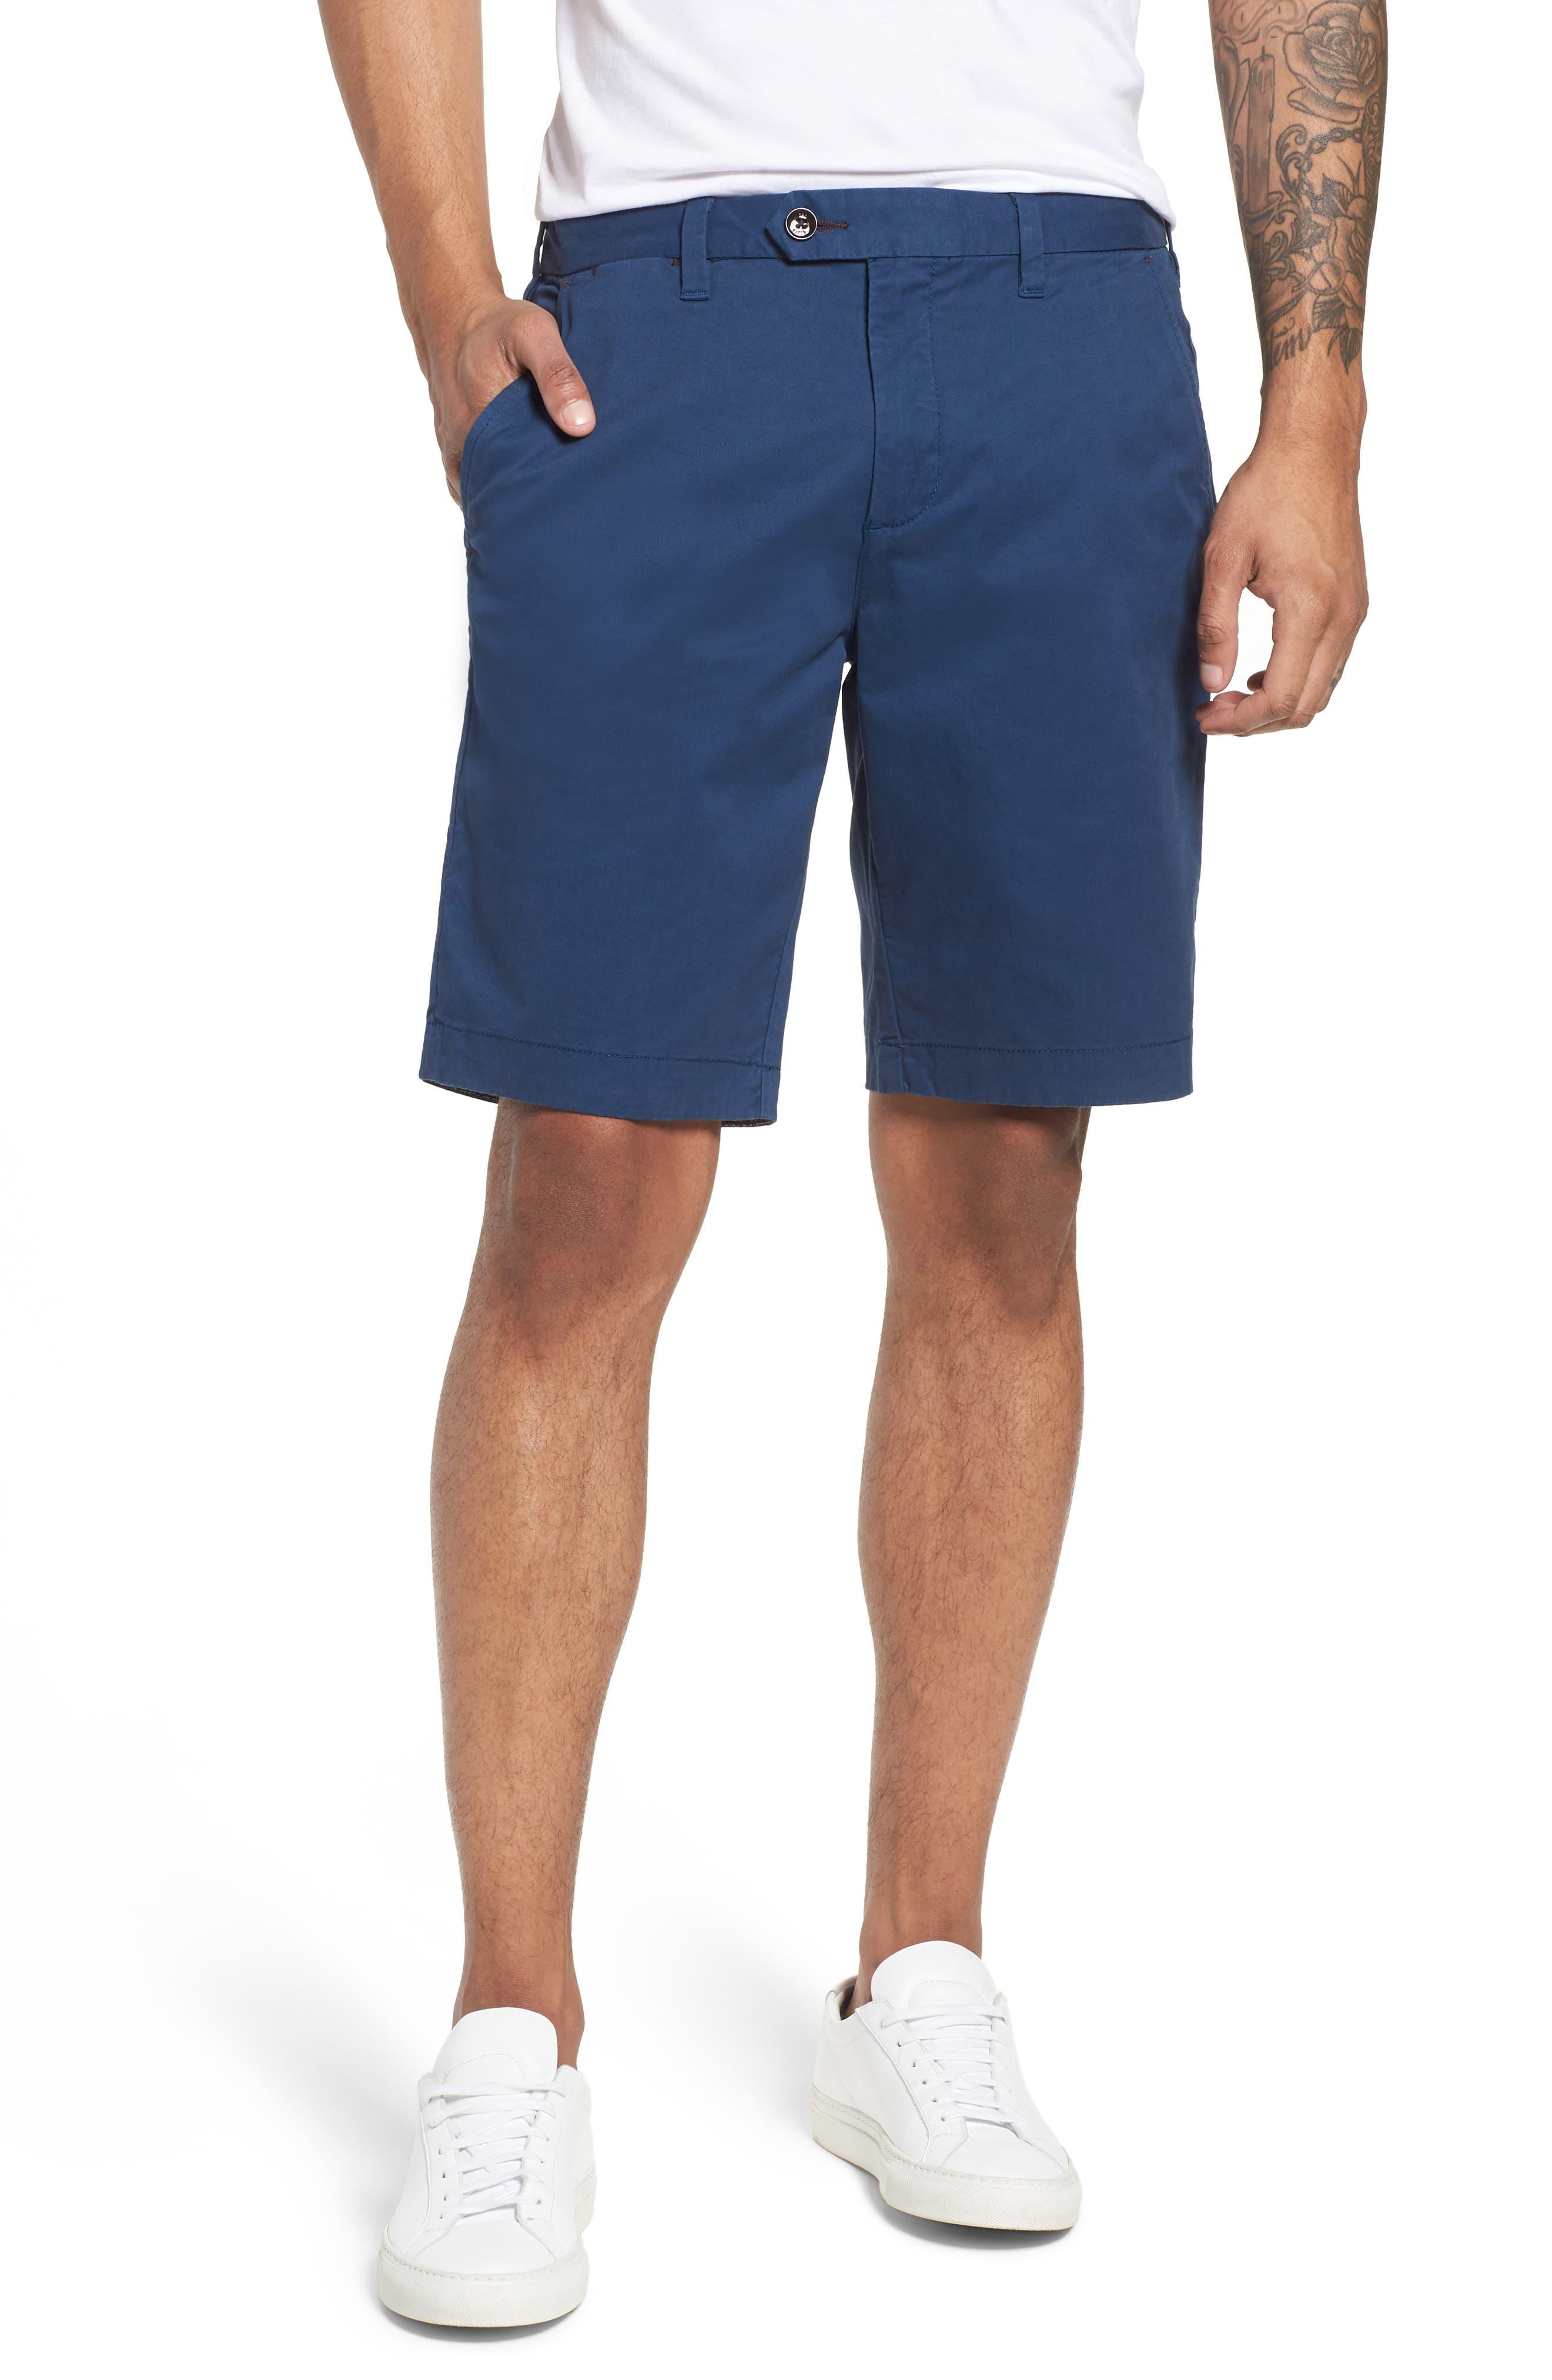 Proshor Slim Fit Chino Shorts,                         Main,                         color, Dark Blue